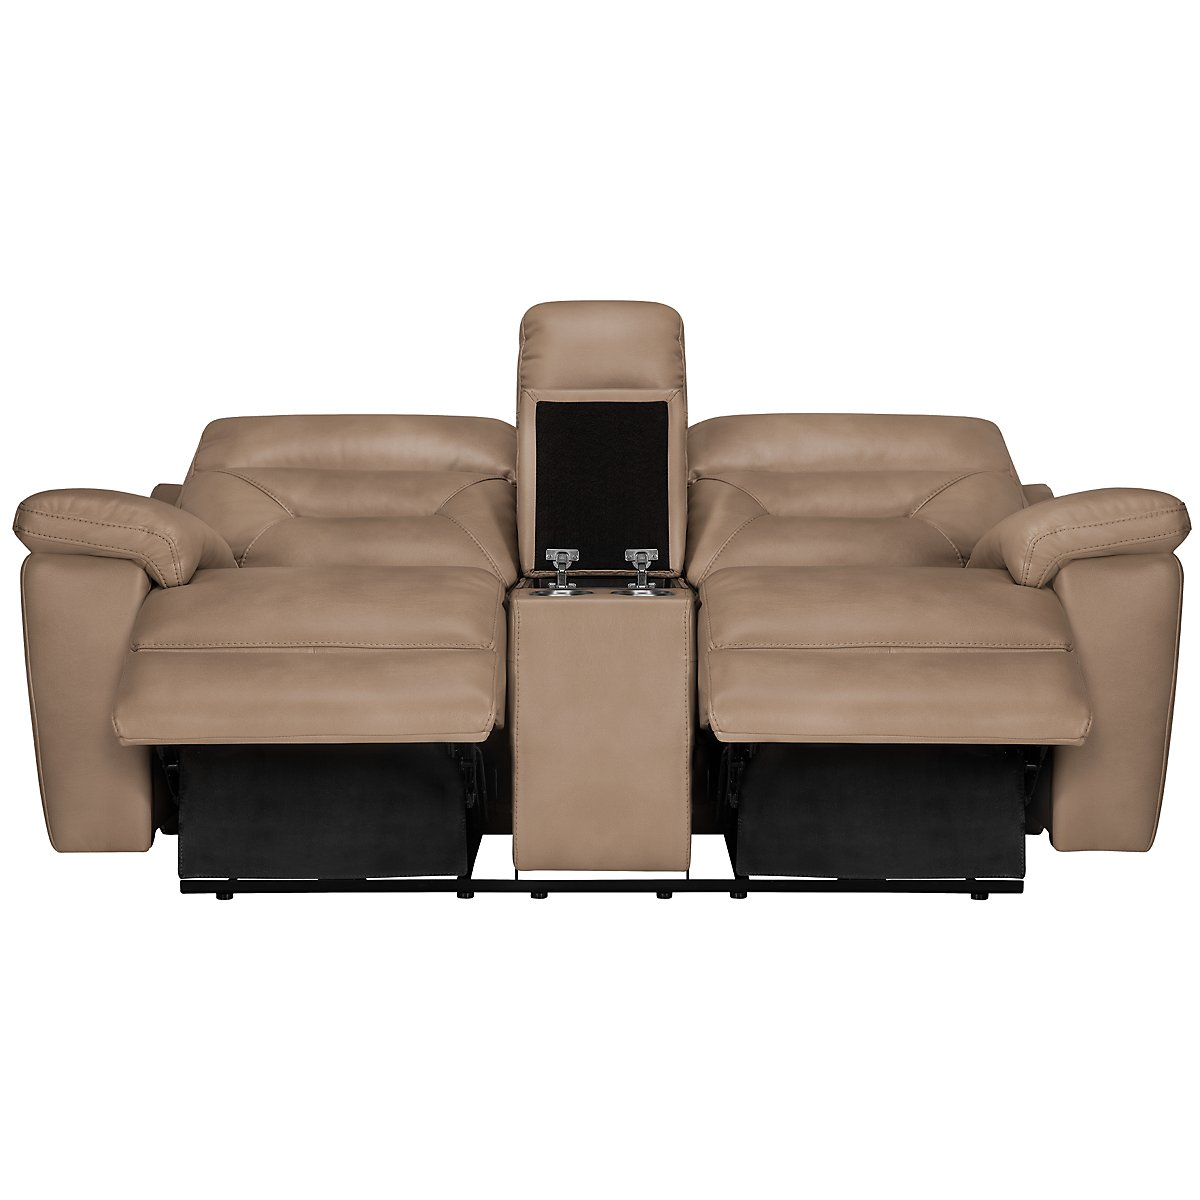 City Furniture Phoenix Dk Beige Microfiber Manually Reclining Living Room